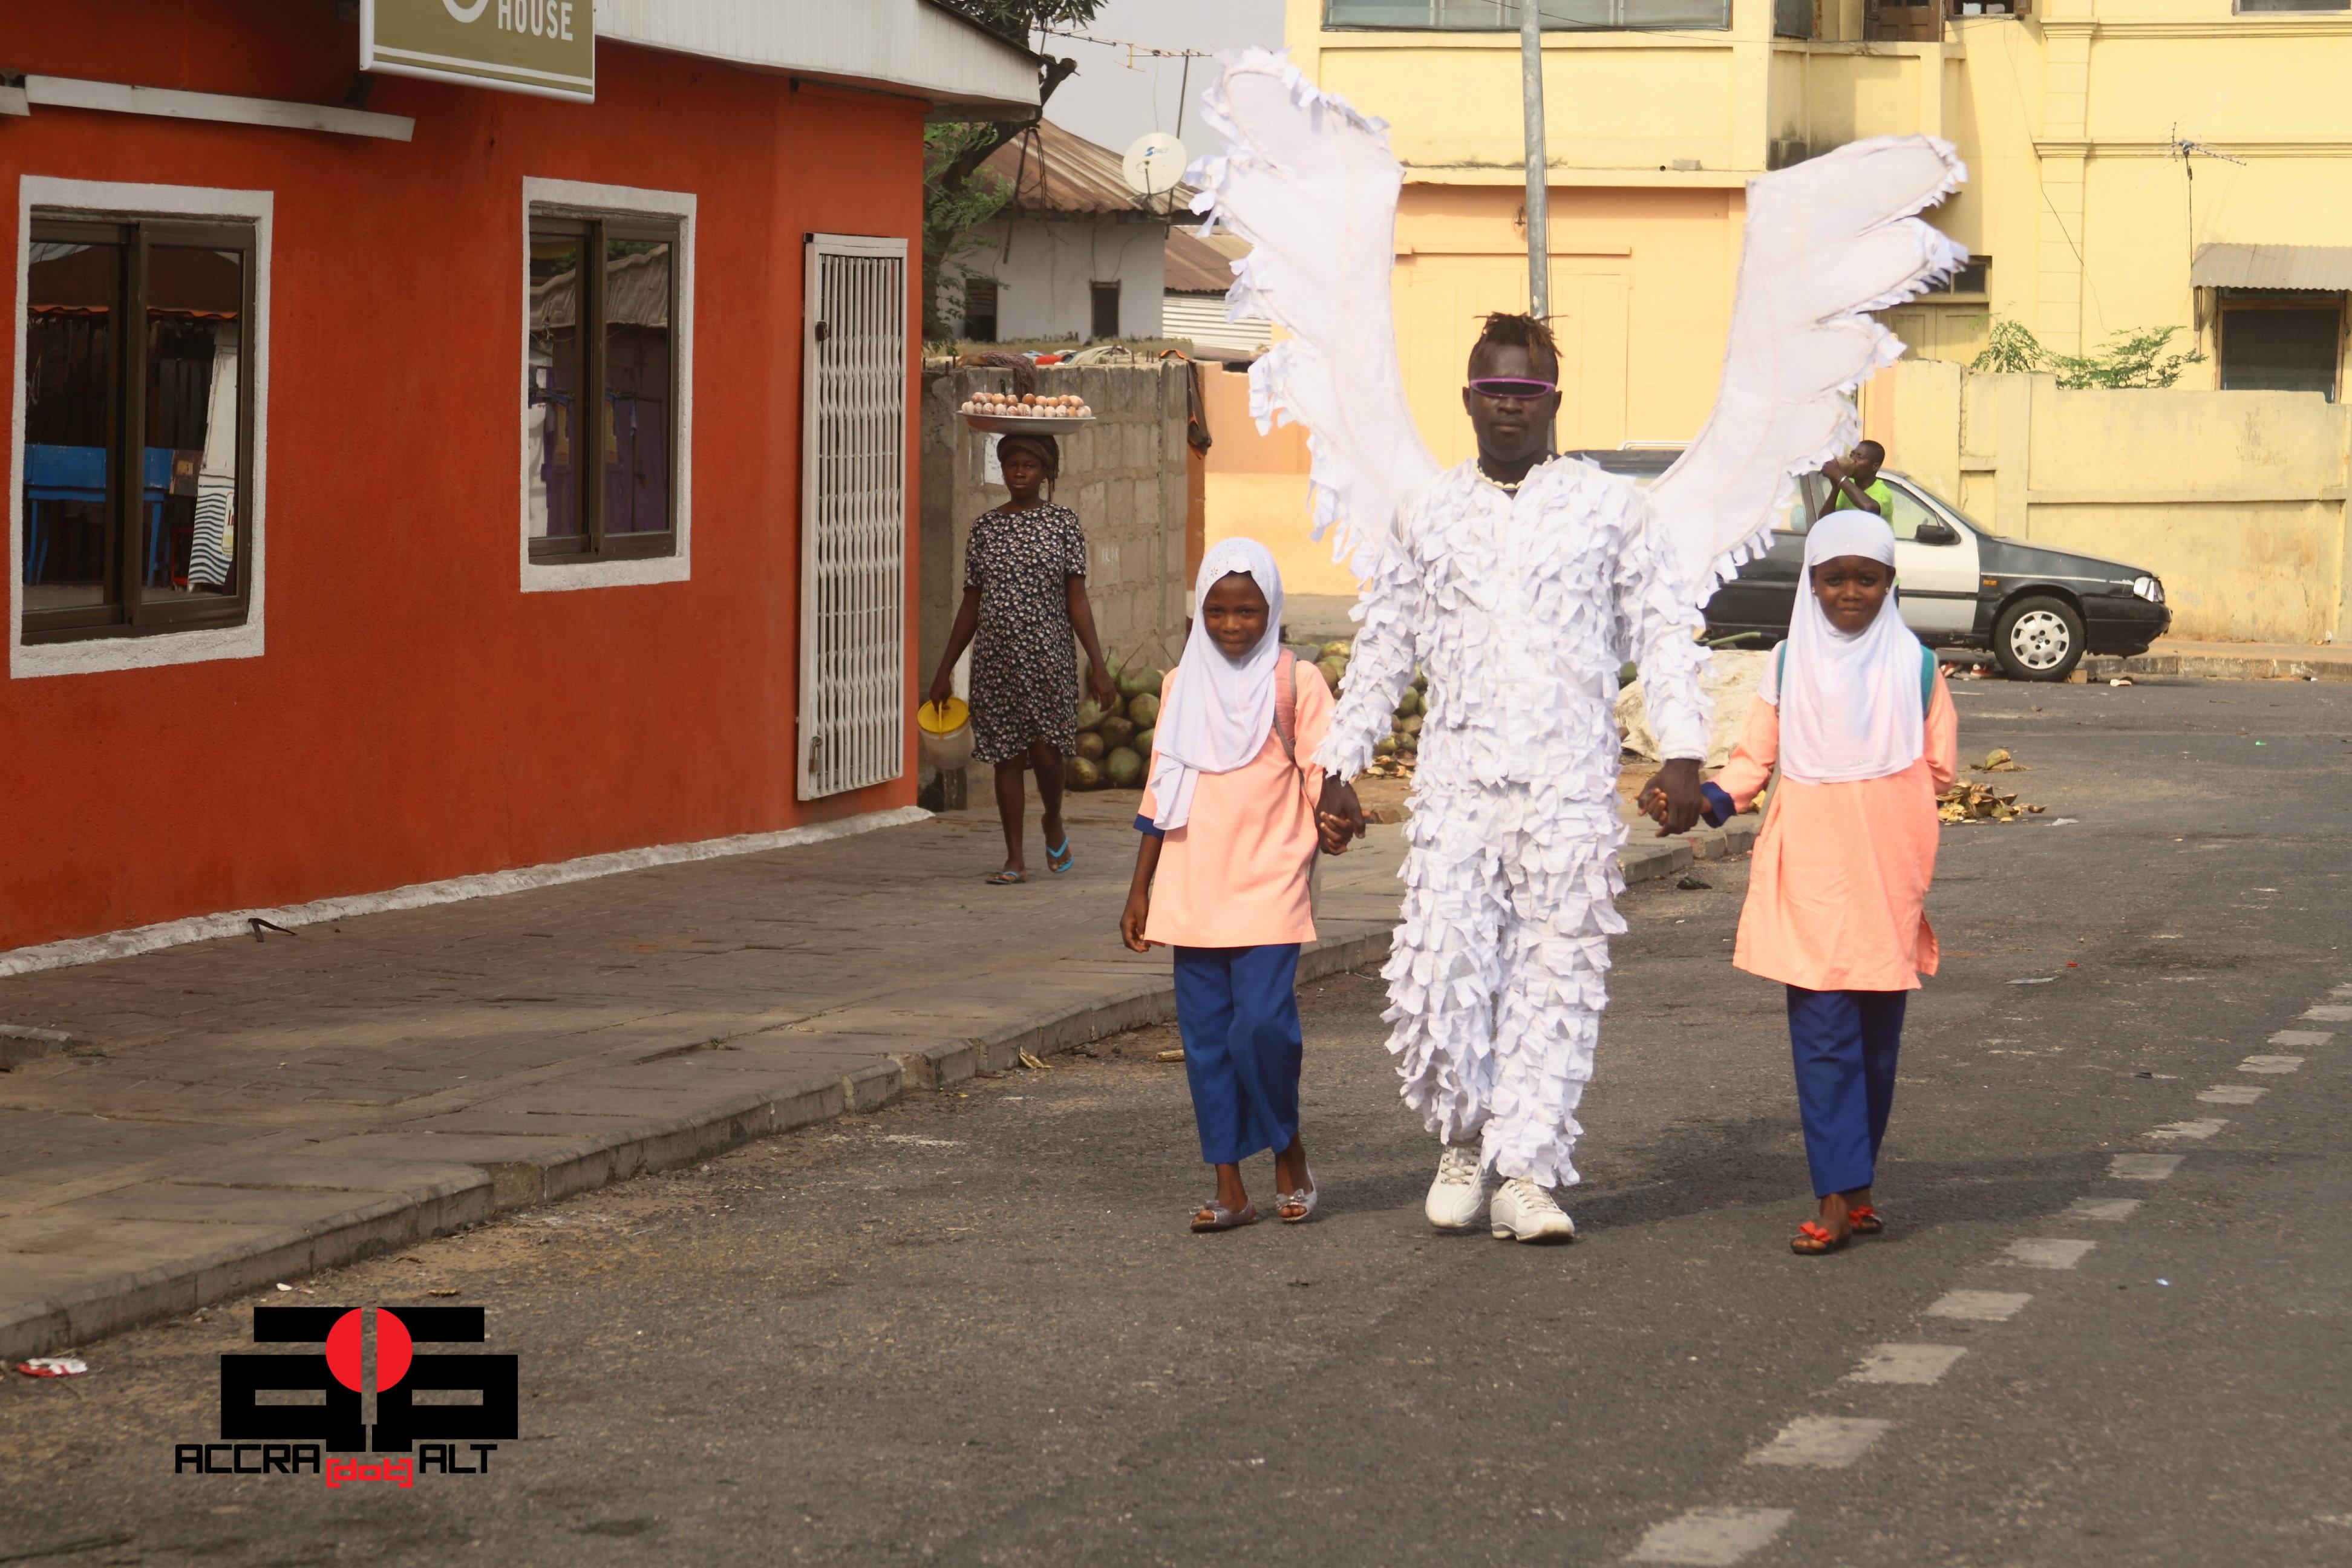 Abrokwah's Angel 9a - photo by ACCRA [dot] ALT